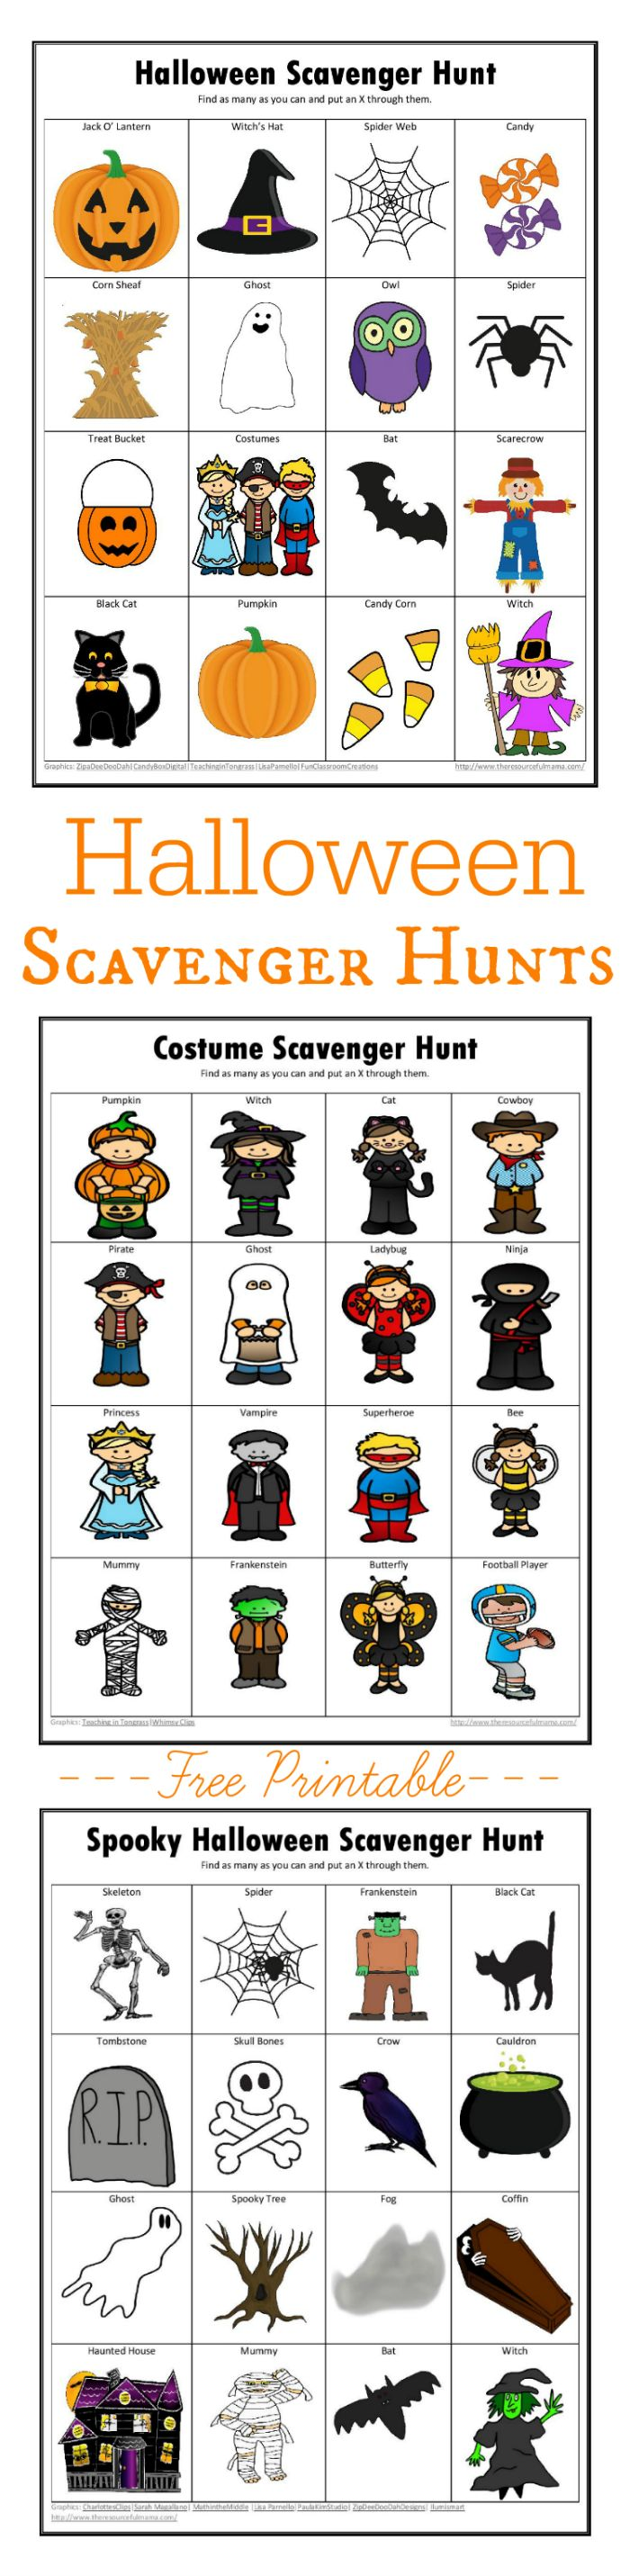 Attività Halloween: la tombola mostruosa - Free printable Halloween scavenger hunts. costume scavenger hunt | spooky Halloween scavenger hunt | not so spooky Halloween scavenger hunt